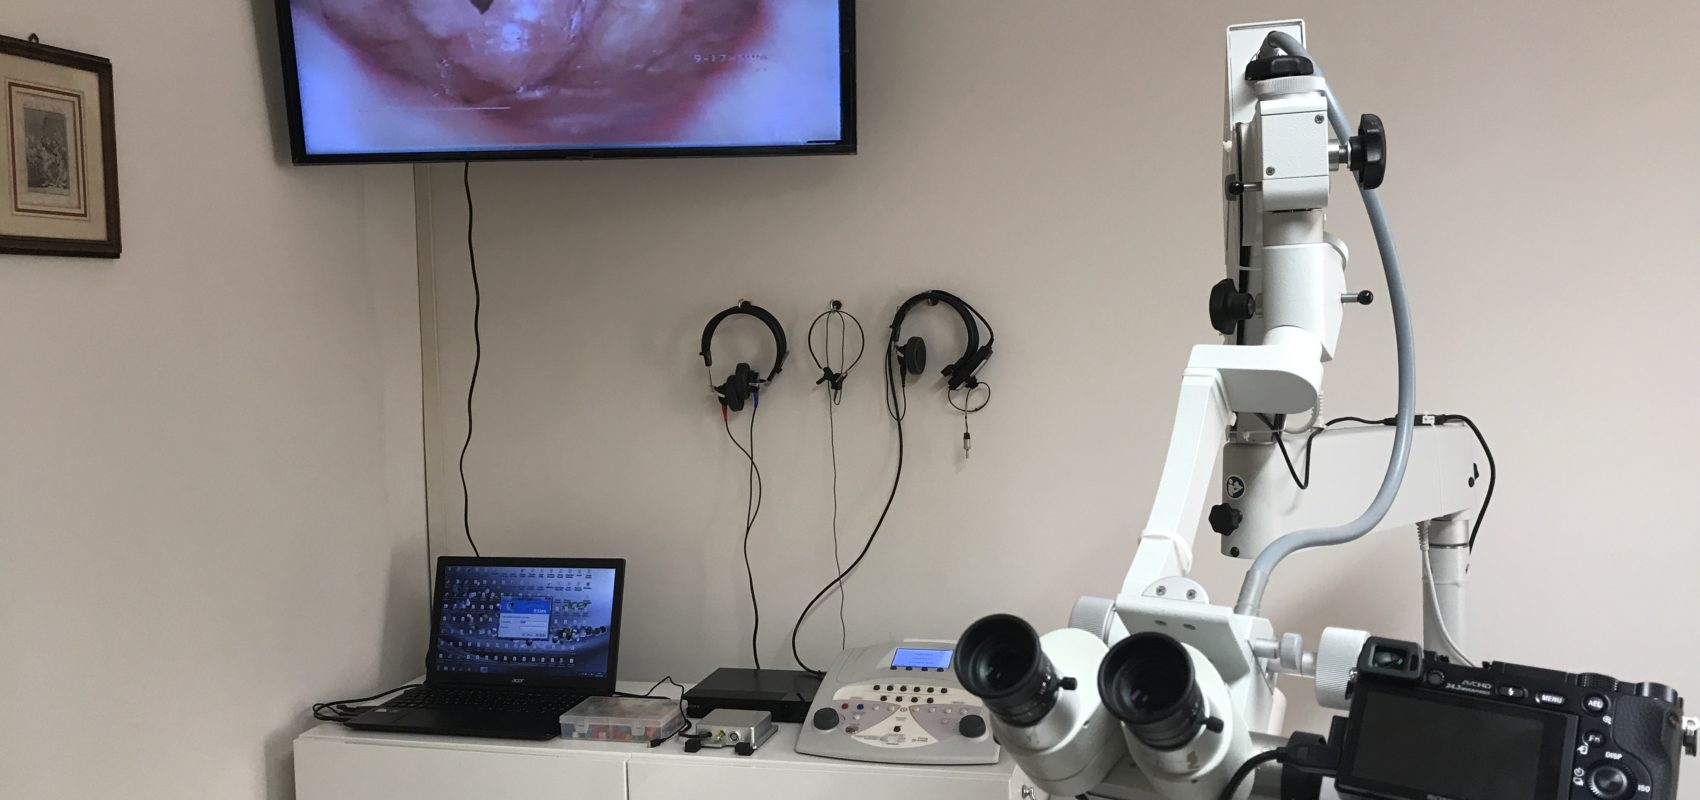 https://www.andrearinciari.it/wp-content/uploads/2019/10/studio-medico-AR.JPG--1700x800.jpg